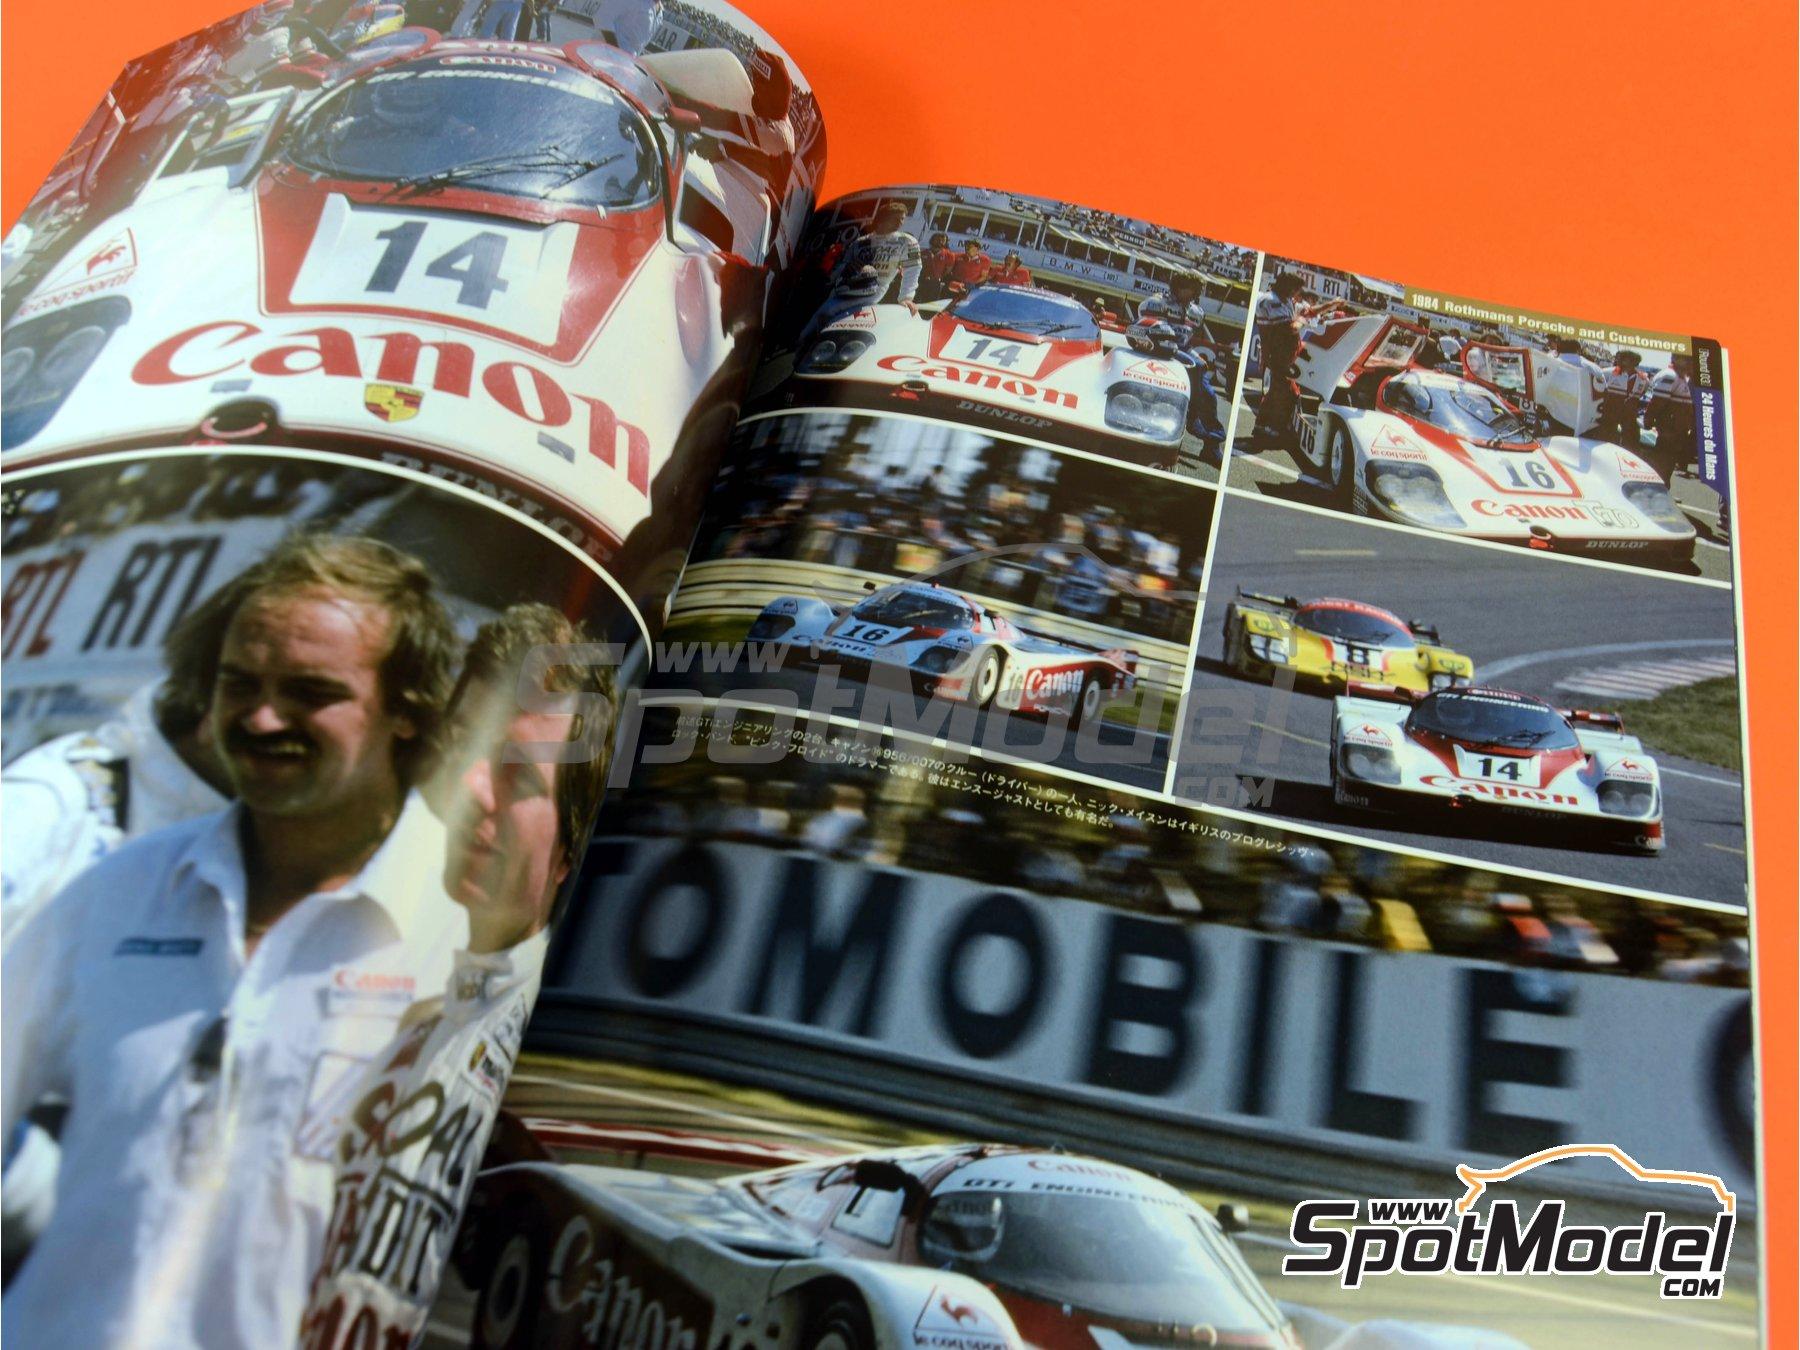 Image 7: Joe Honda Sportscar Spectacles - Porsche 956 - 24 Horas de Le Mans, 1000 Kilómetros de Suzuka, 6 Horas de Silverstone, 6 Horas de Fuji 1982, 1983, 1984, 1985 y 1985 | Libro de referencia fabricado por Model Factory Hiro (ref.MFH-SS007)